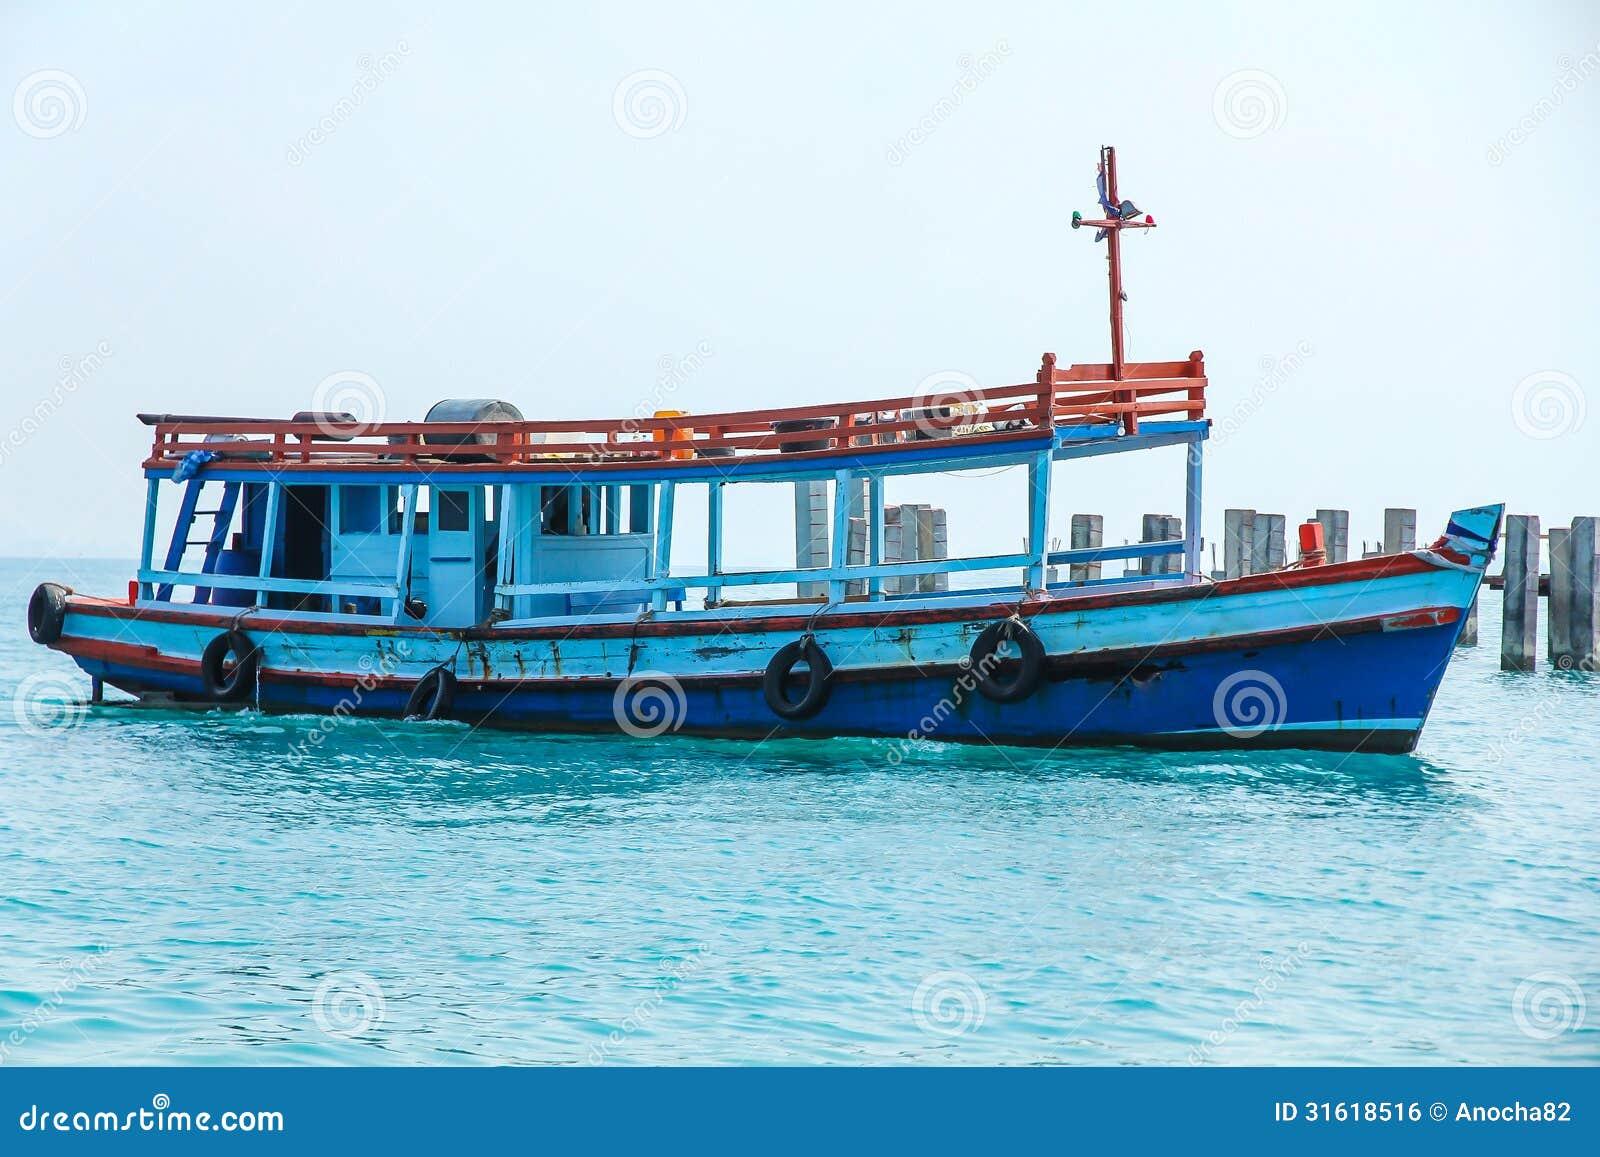 Fishing boat royalty free stock image image 31618516 for Free fishing boats